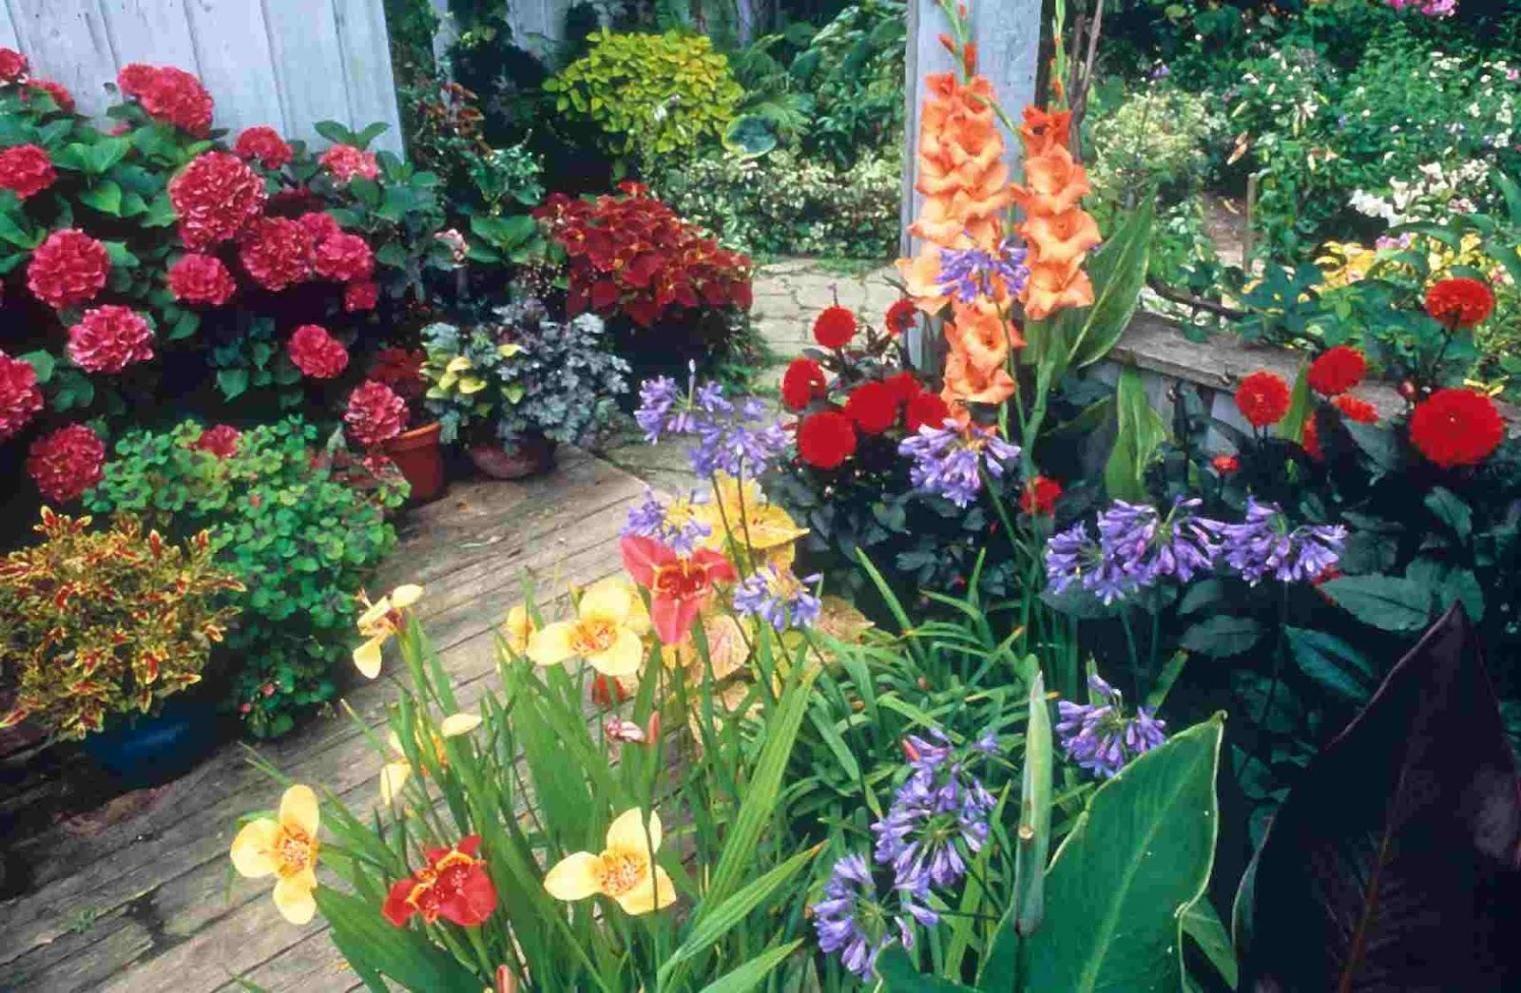 Beautiful Small Flower Gardens Patio Ideas Plant Selection Gardening Flower Garden Design Container Garden Design Small Flower Gardens Backyard flower garden ideas